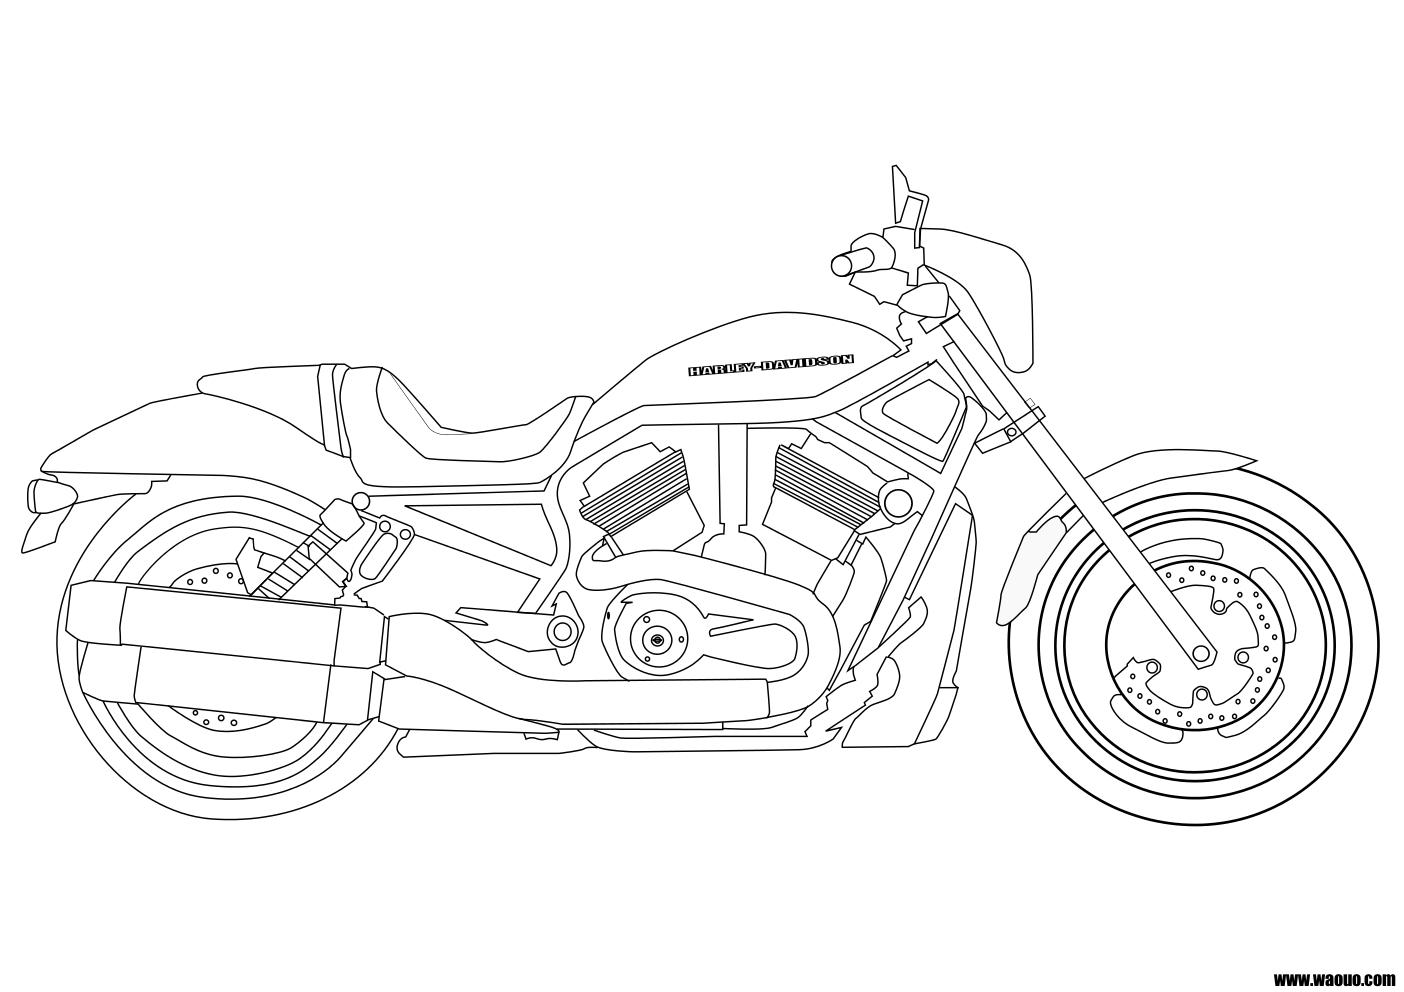 coloriage gratuit moto scooter honda yamaha suzuki imprimer et colorier. Black Bedroom Furniture Sets. Home Design Ideas